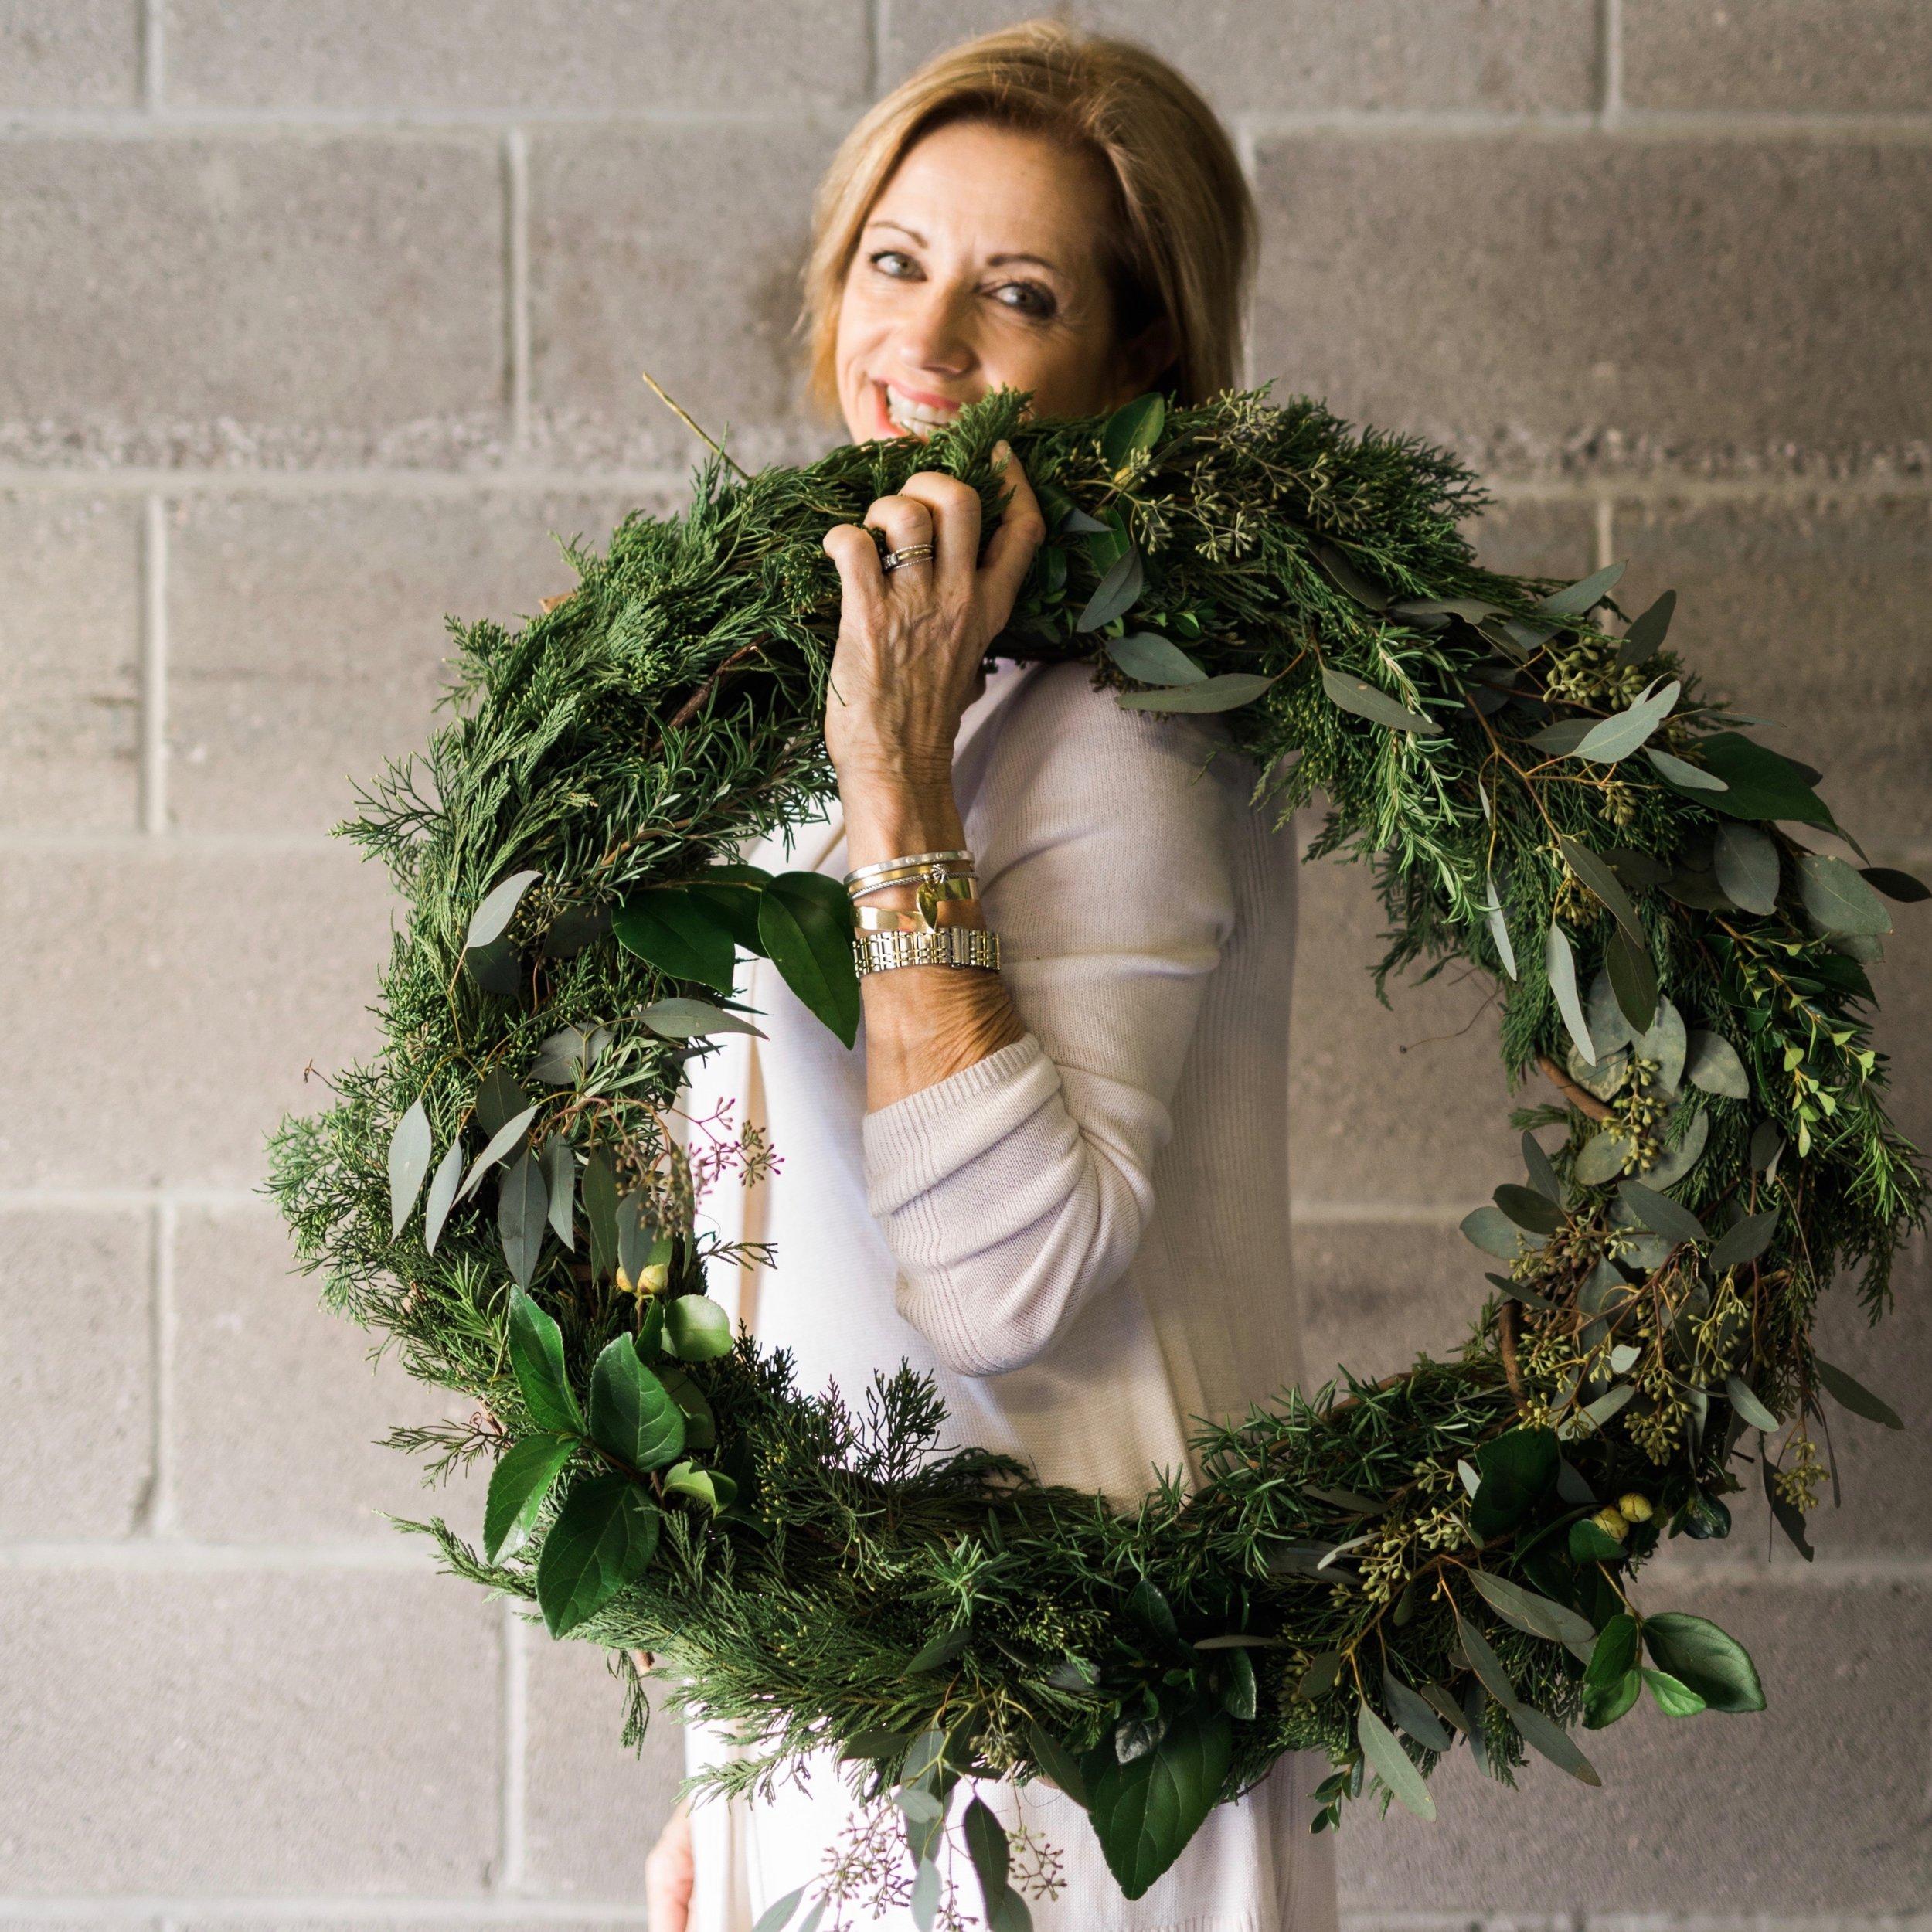 white sweater wreath on shoulder soft smile.jpg